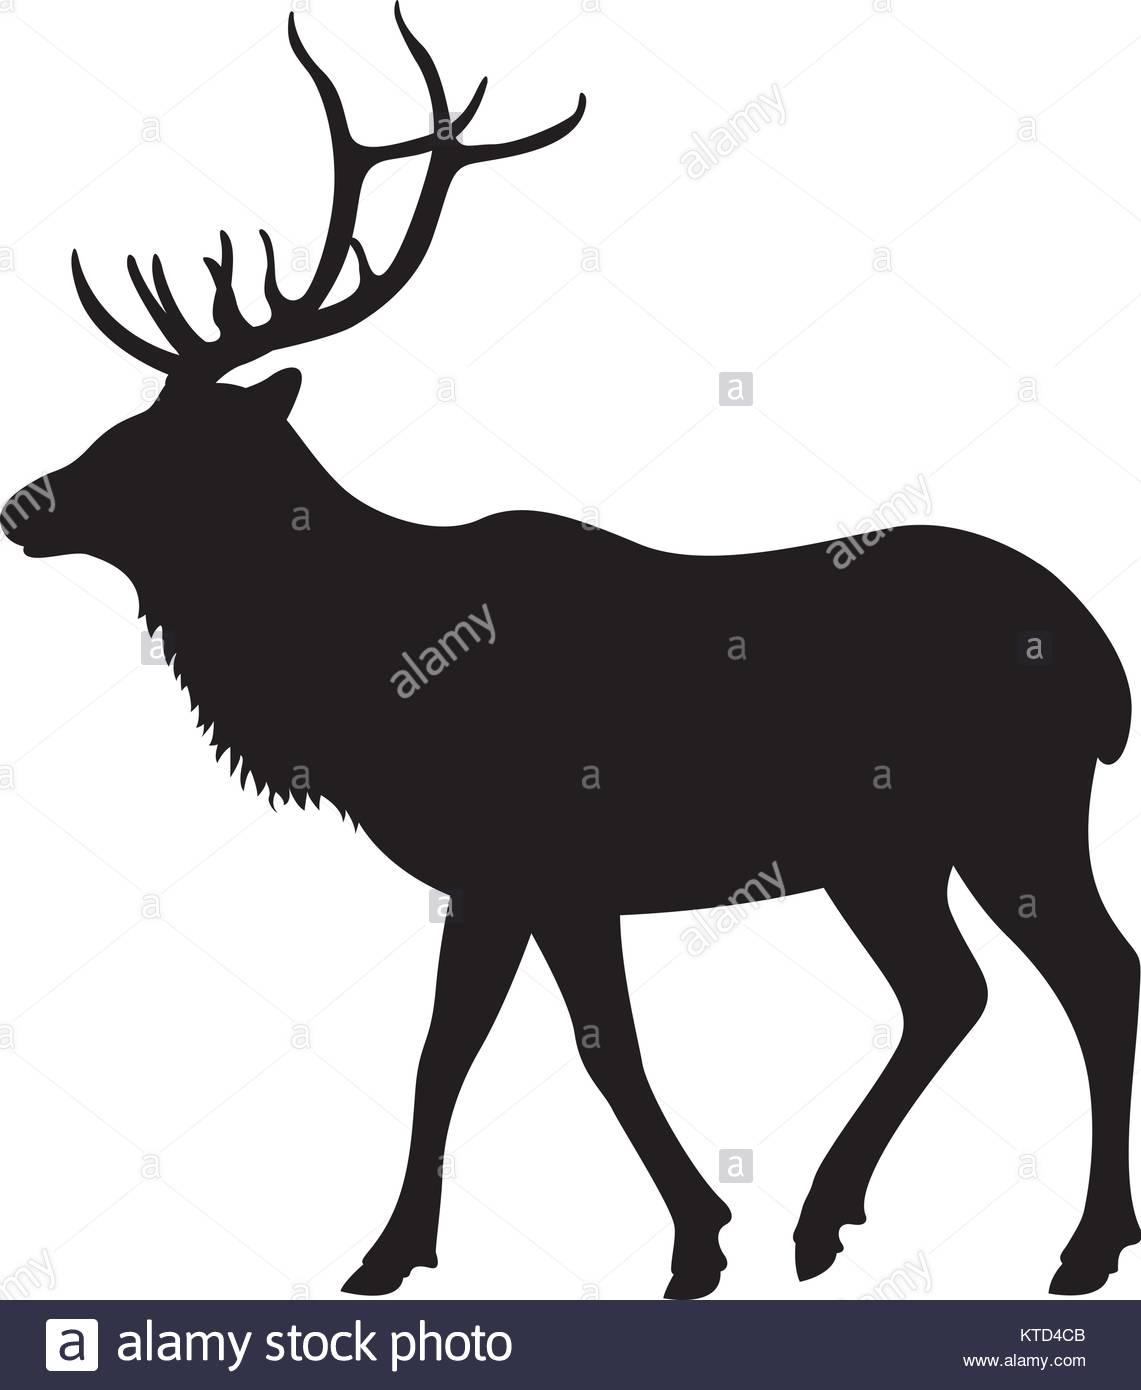 1141x1390 Big Deer Vector Illustration Black Silhouette Profile Side Stock